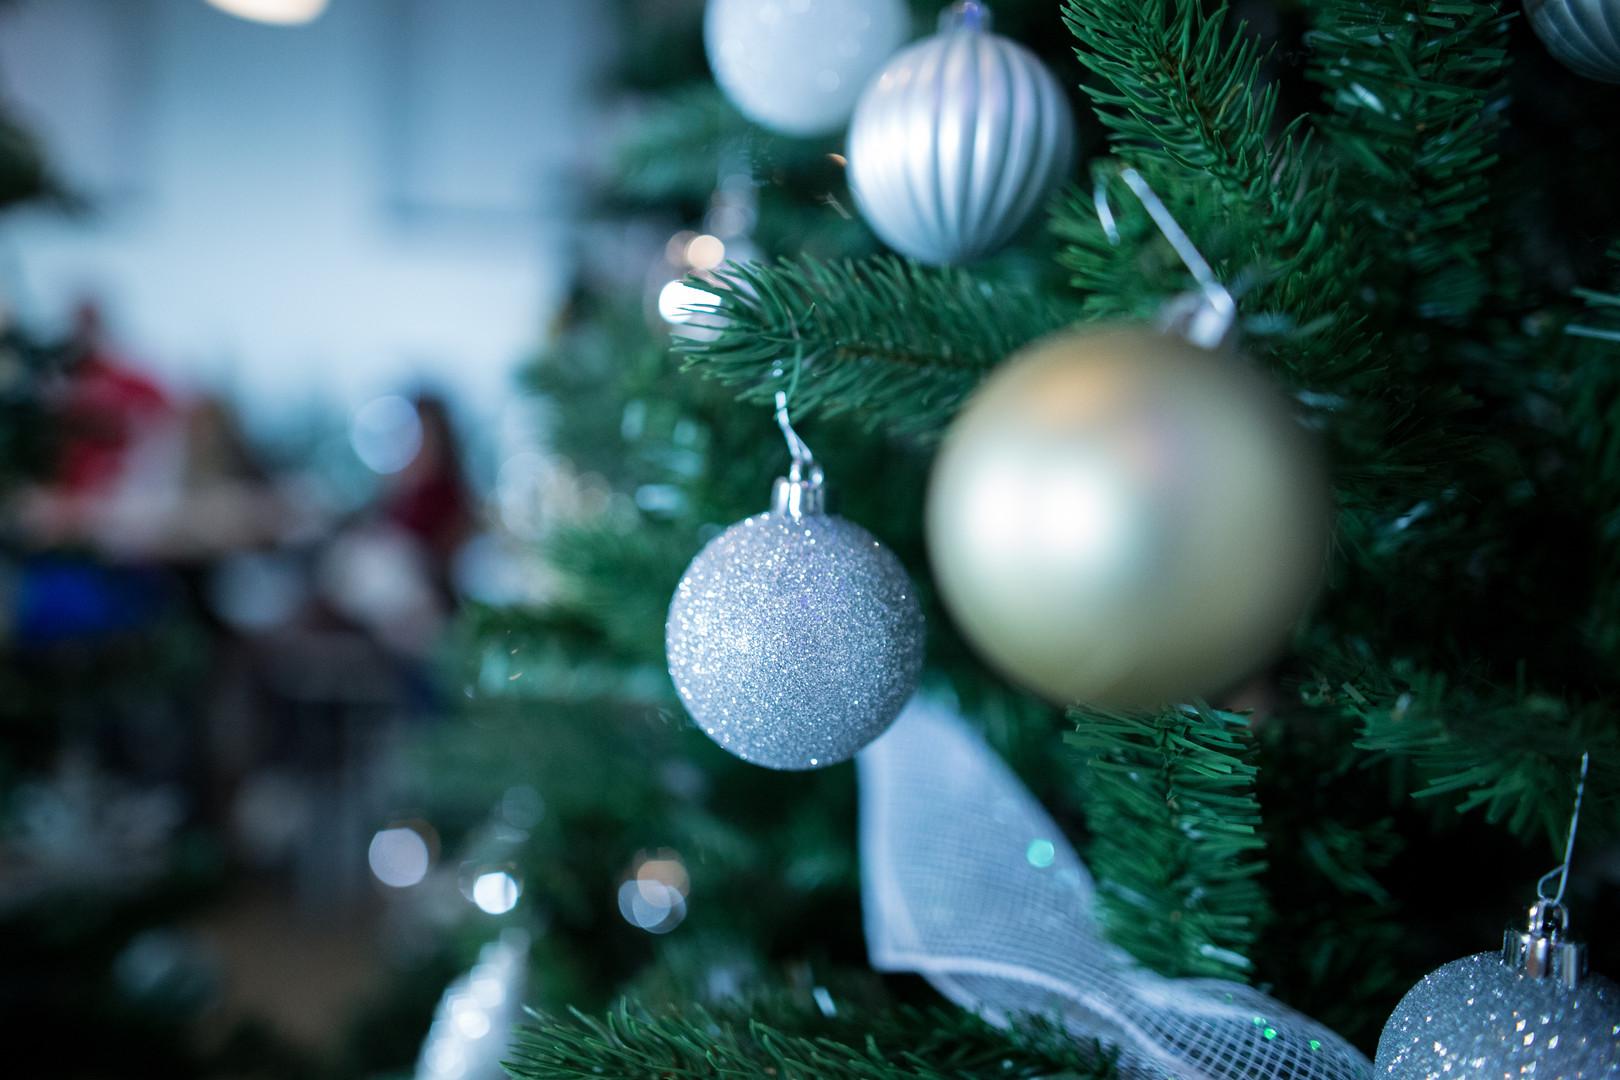 ChristmasStockPhotography_Ornament3.jpg